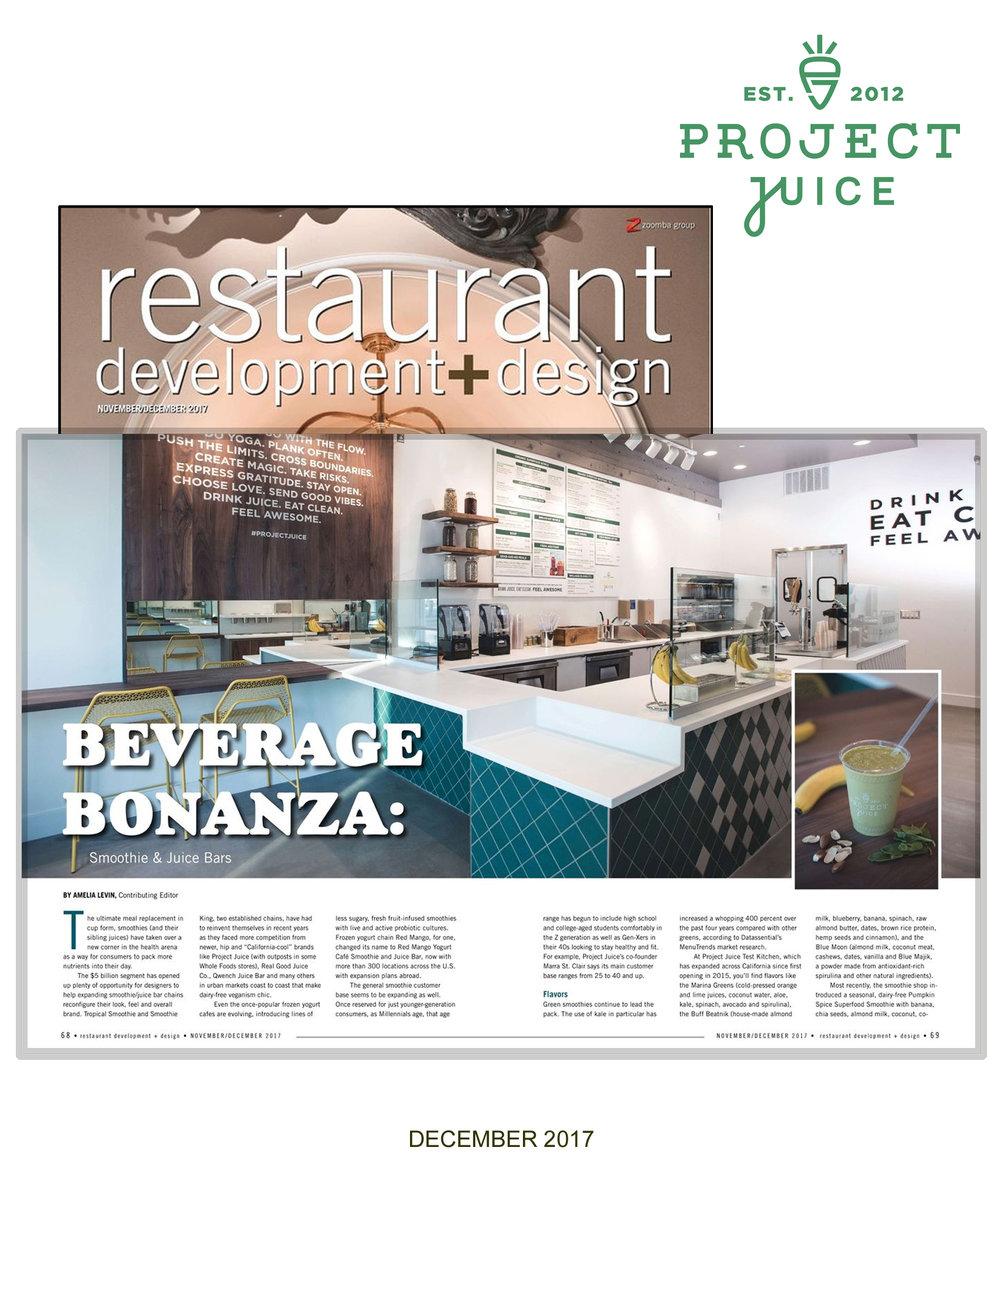 RestaurantDevDesign_Dec2017.jpg